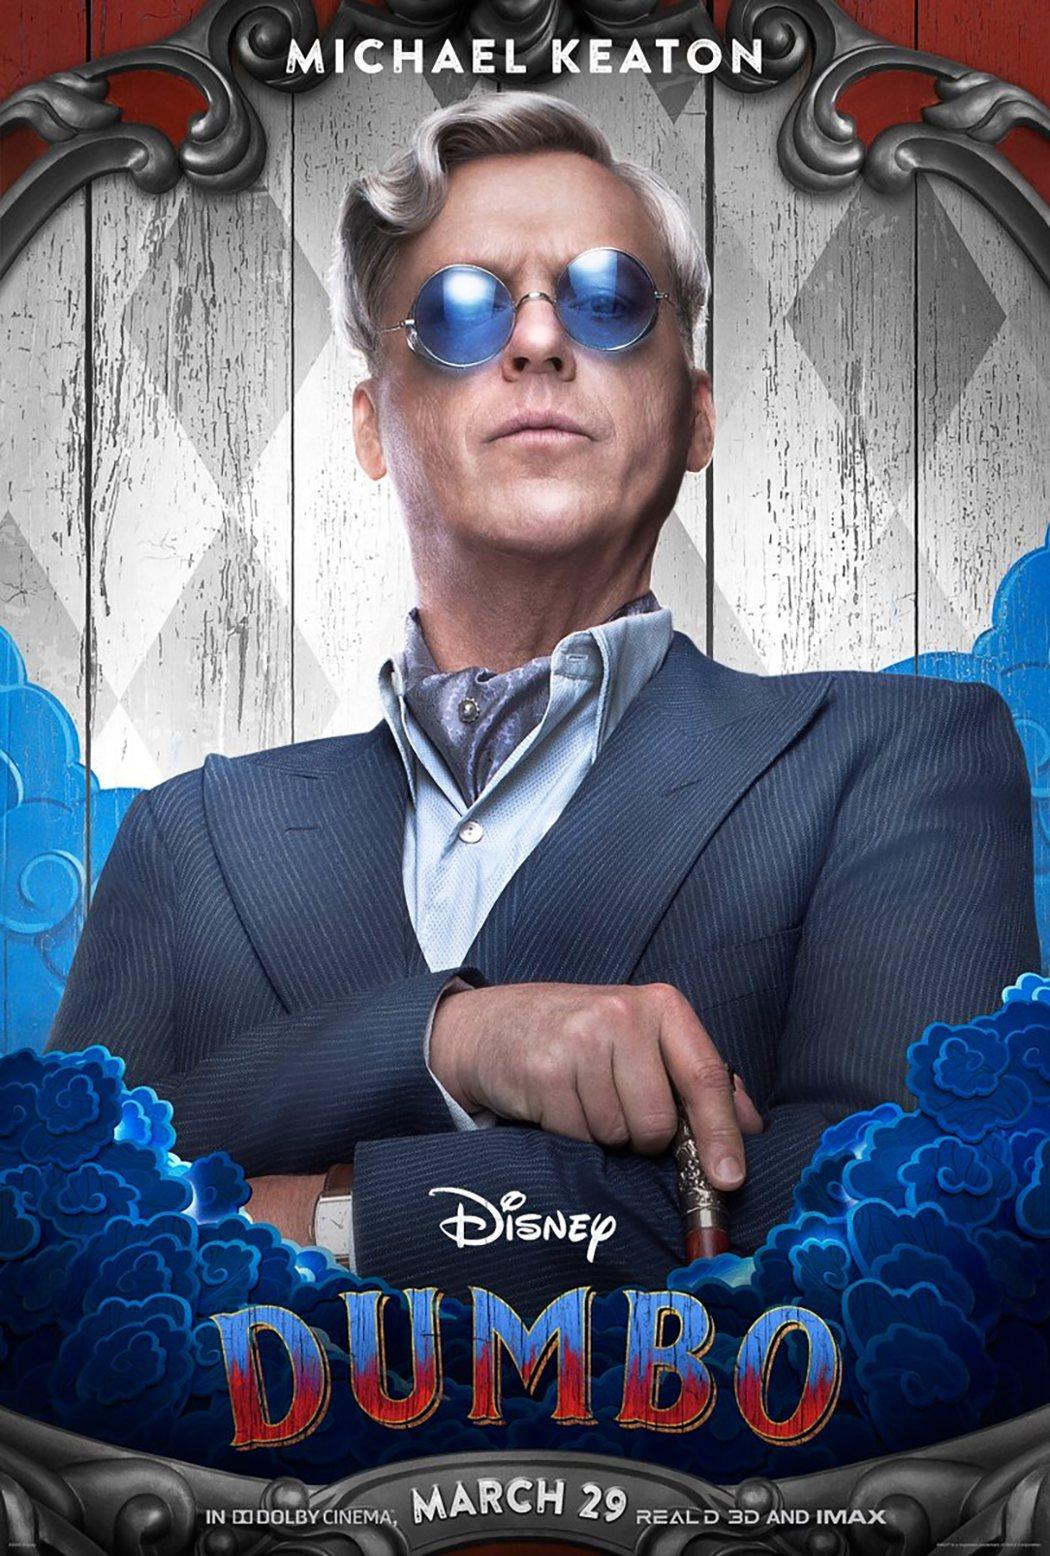 Póster de V.A. Vandevere (Michael Keaton)